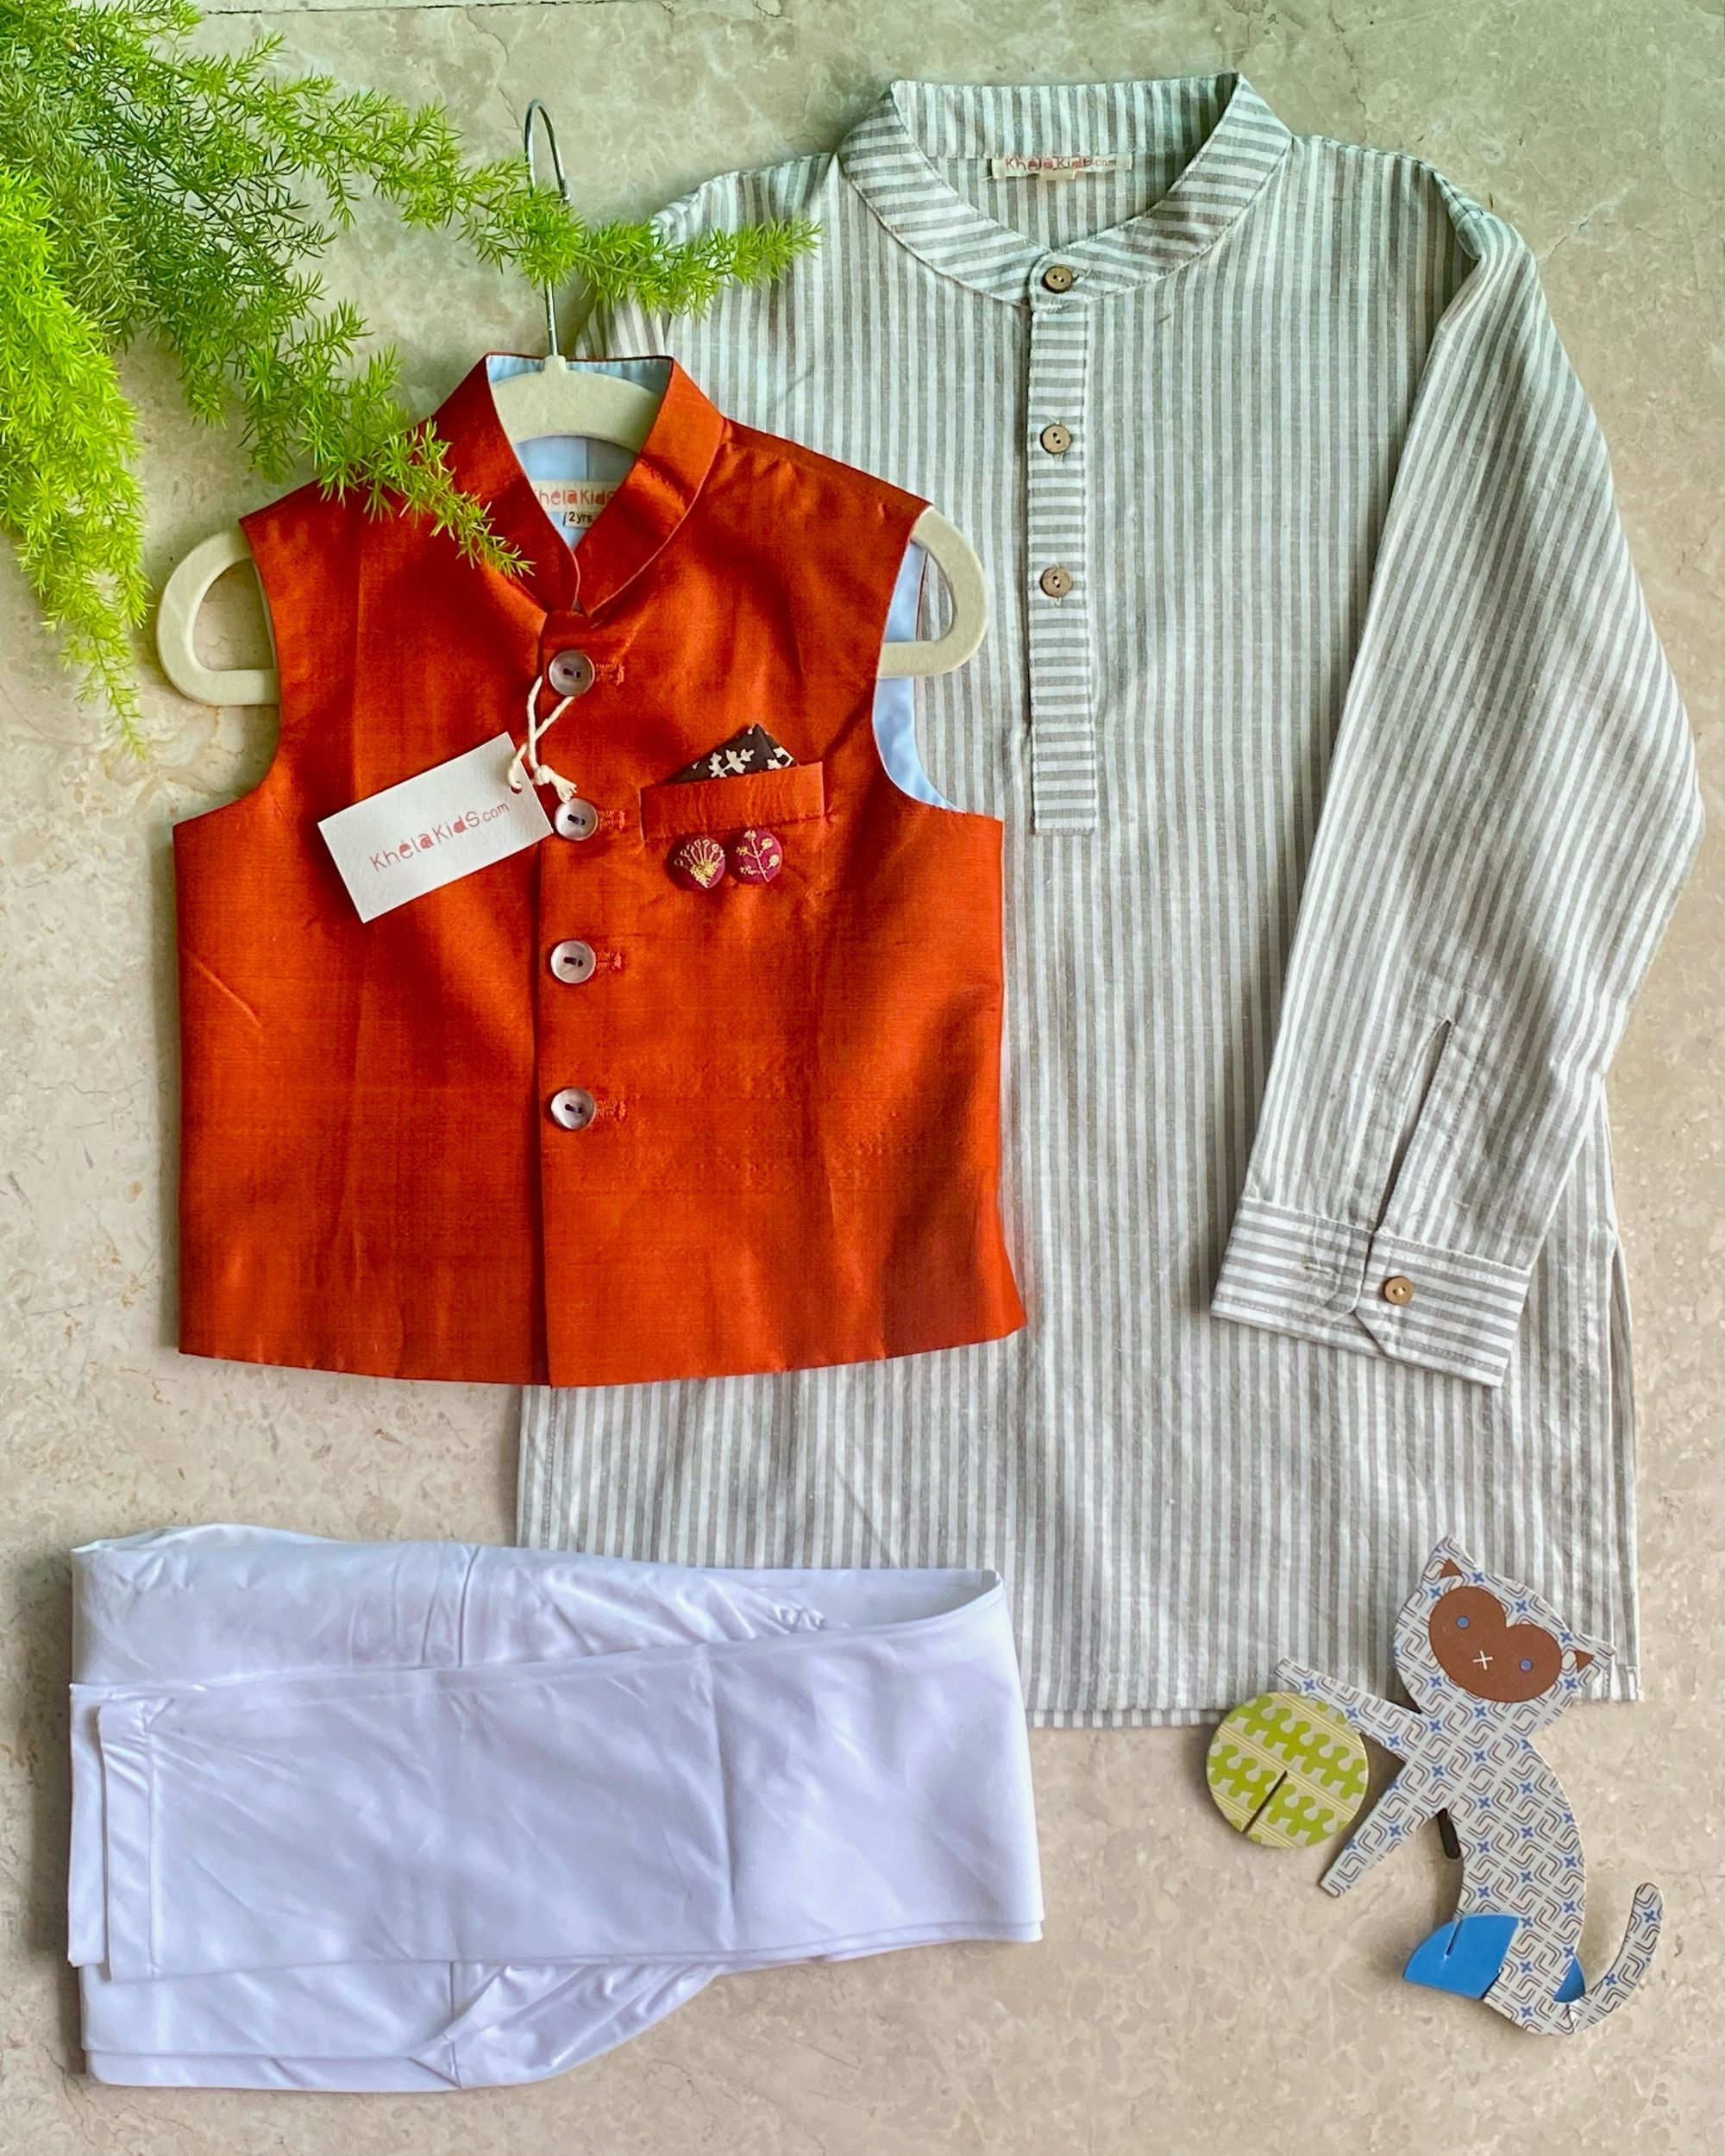 Off white and grey striped kurta with pyjama and bandi jacket - set of three